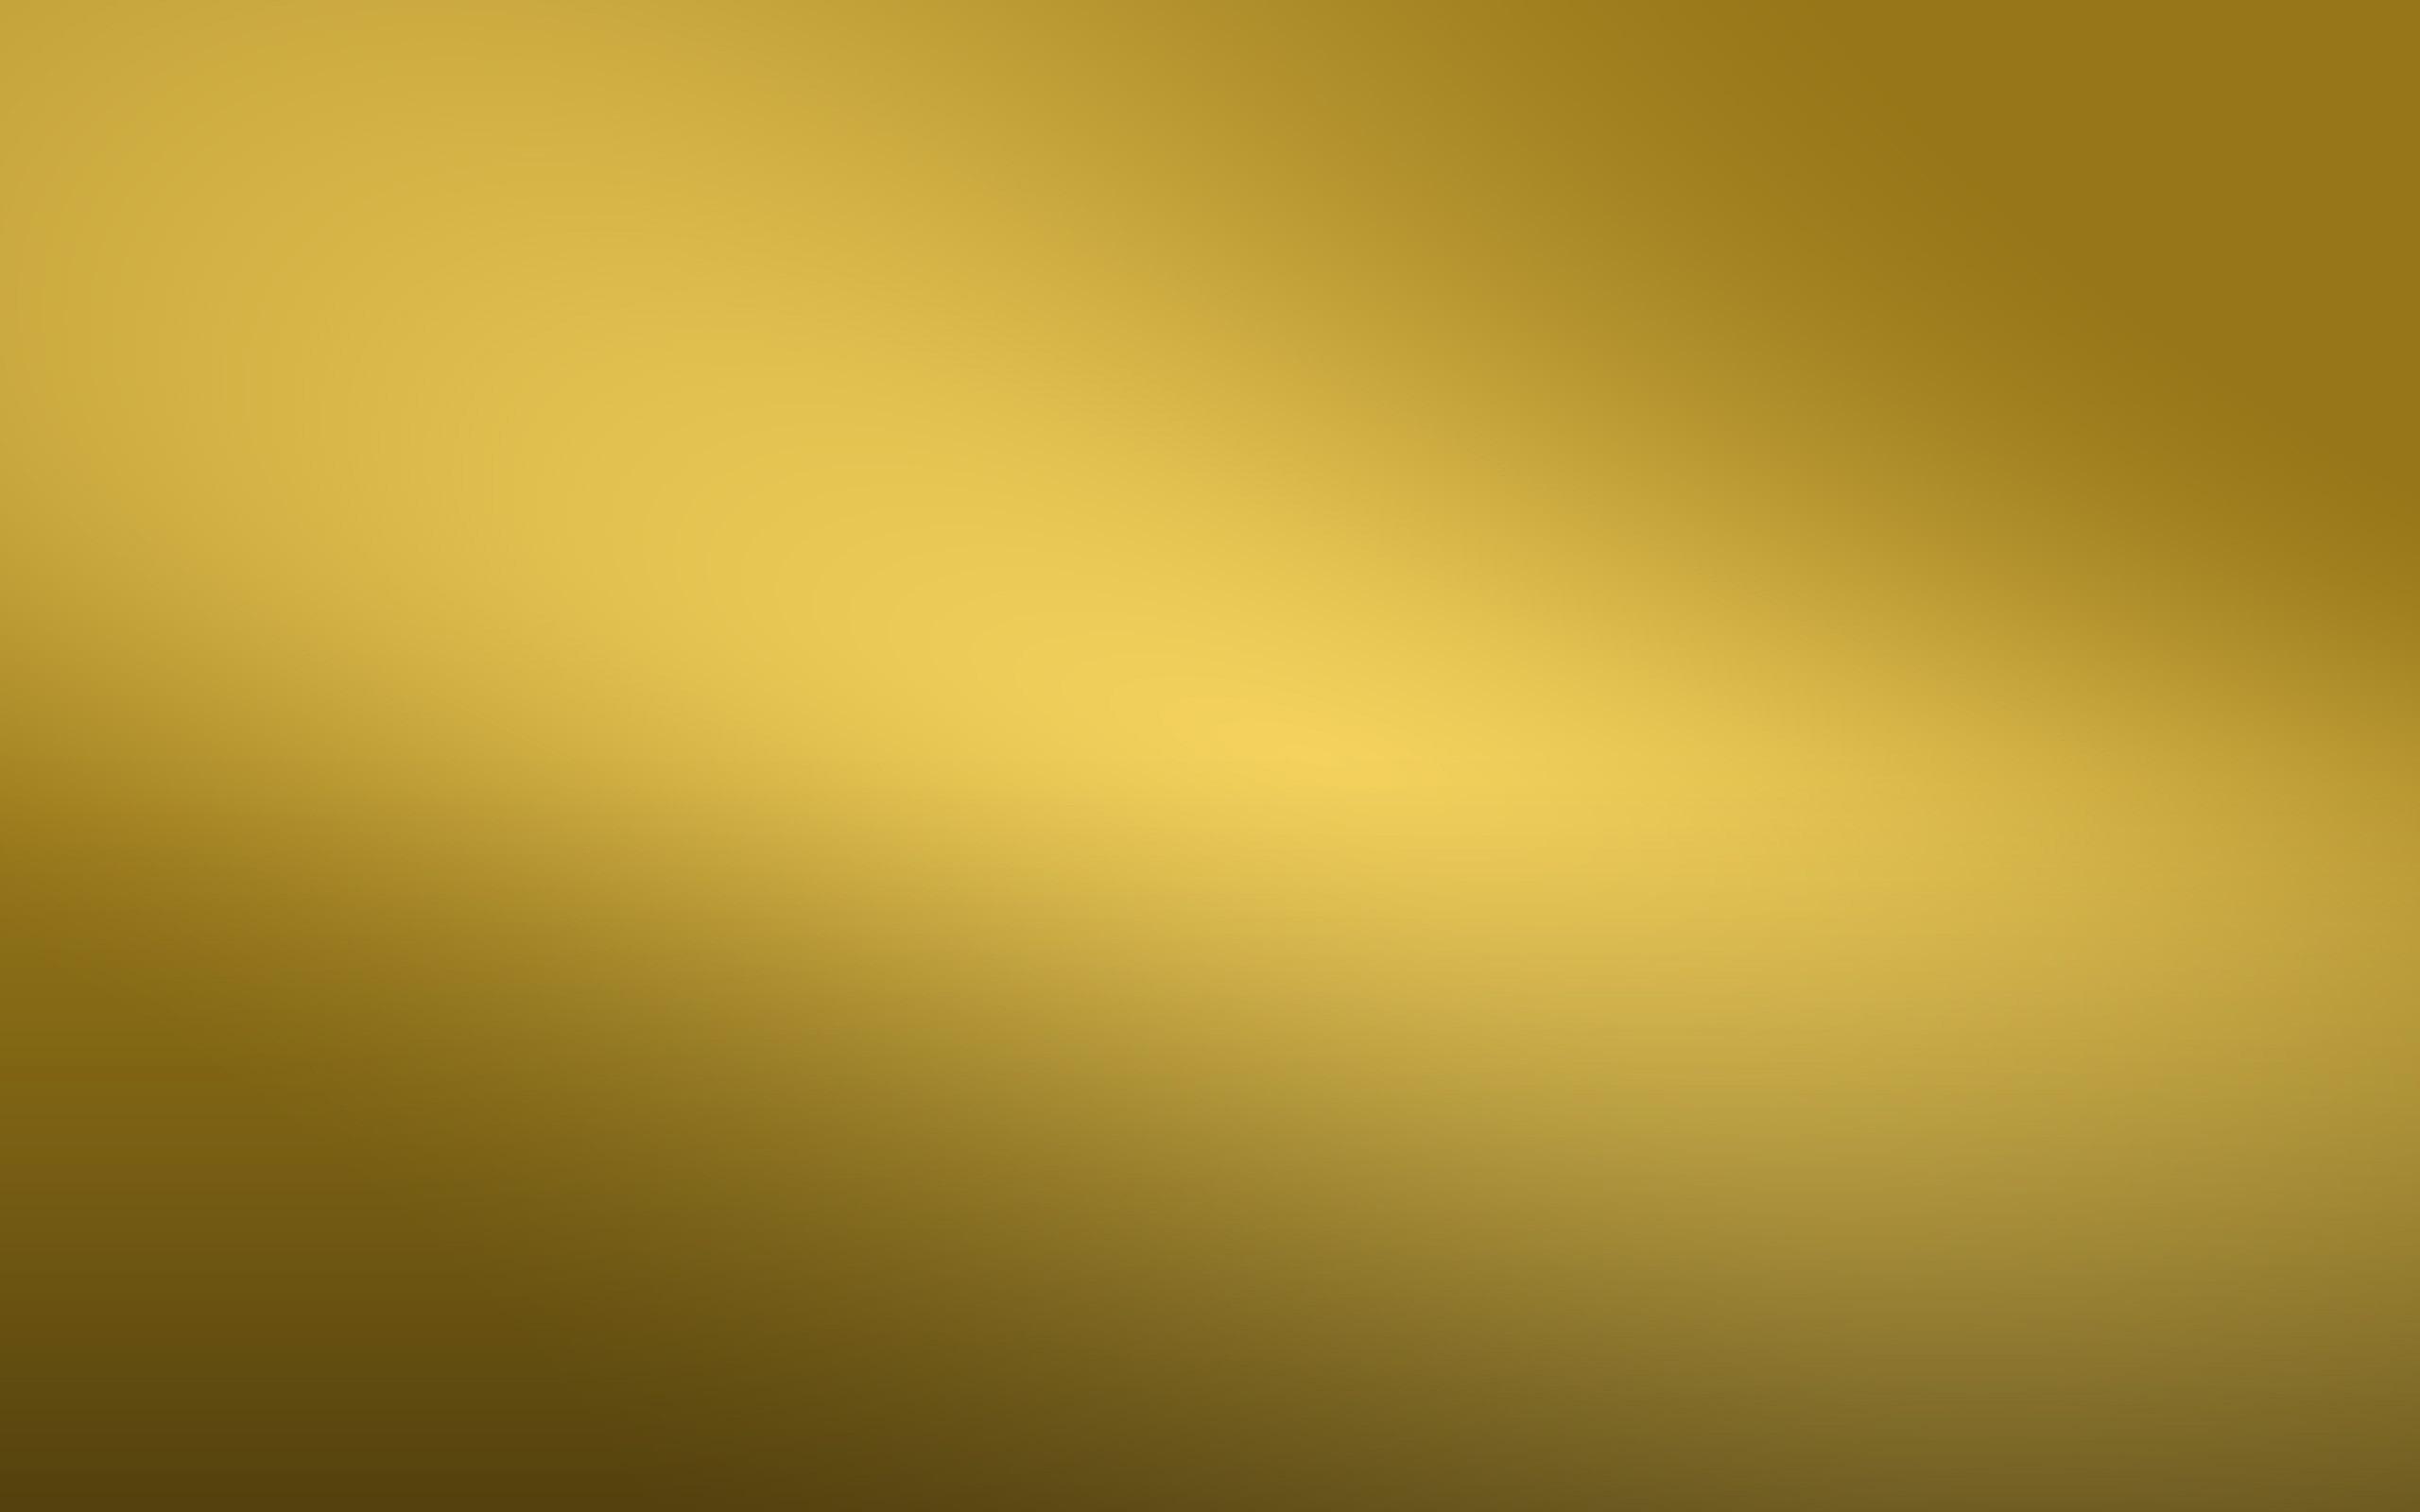 Gold Gradient Wallpaper Background 49494